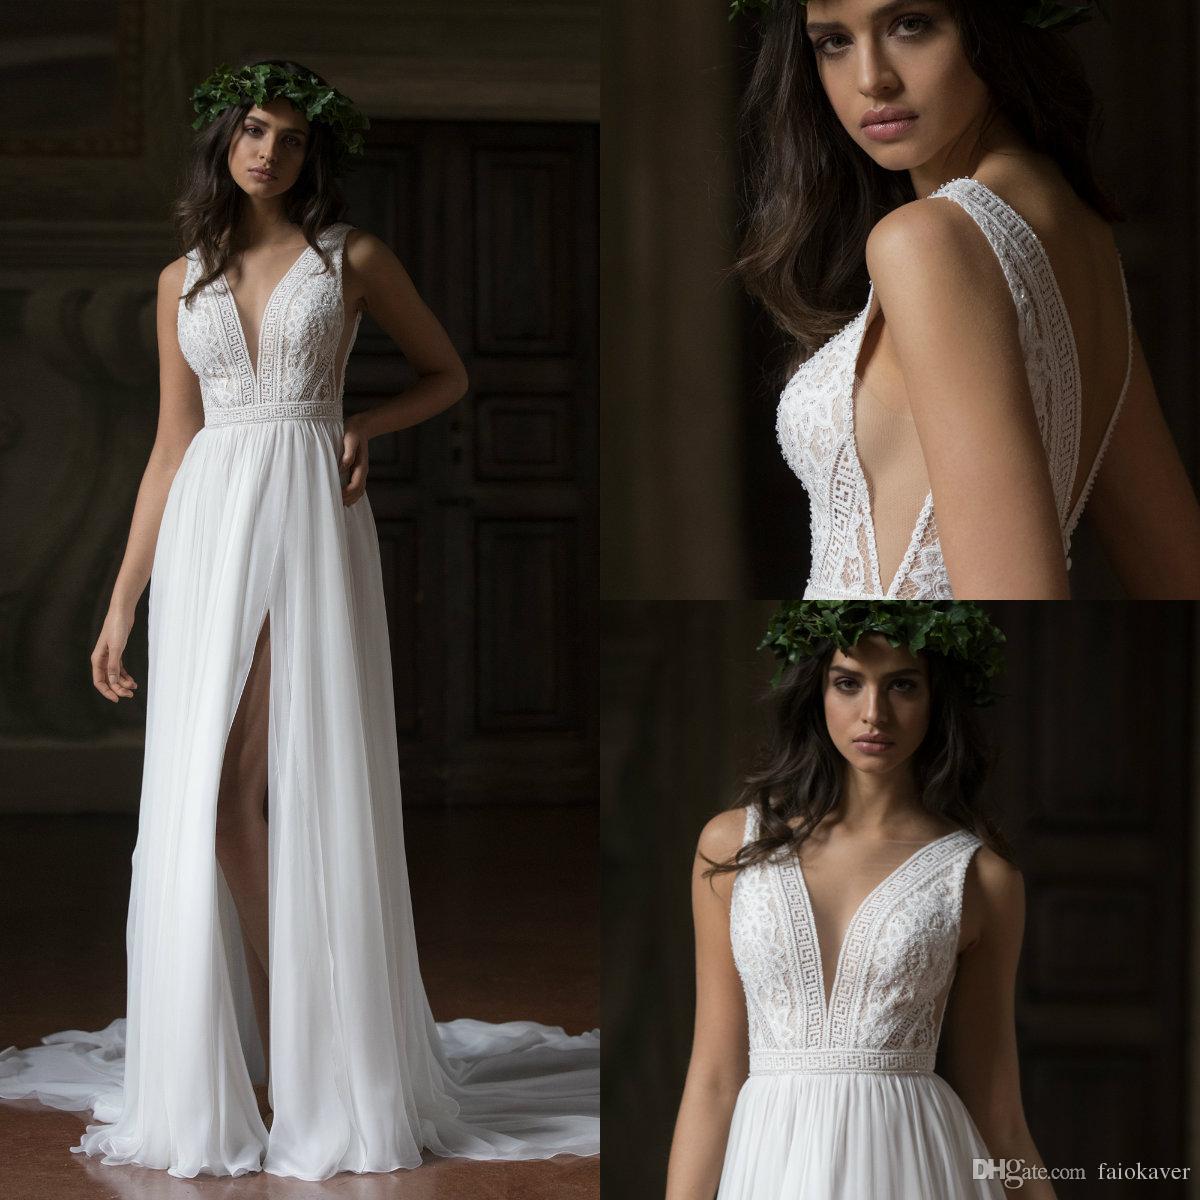 Summer Beach 2019 A Line Wedding Dresses Sexy Lace Appliqued V Neck High Split Chiffon Cheap Bridal Gowns Sweep Train Cheap Wedding Dress